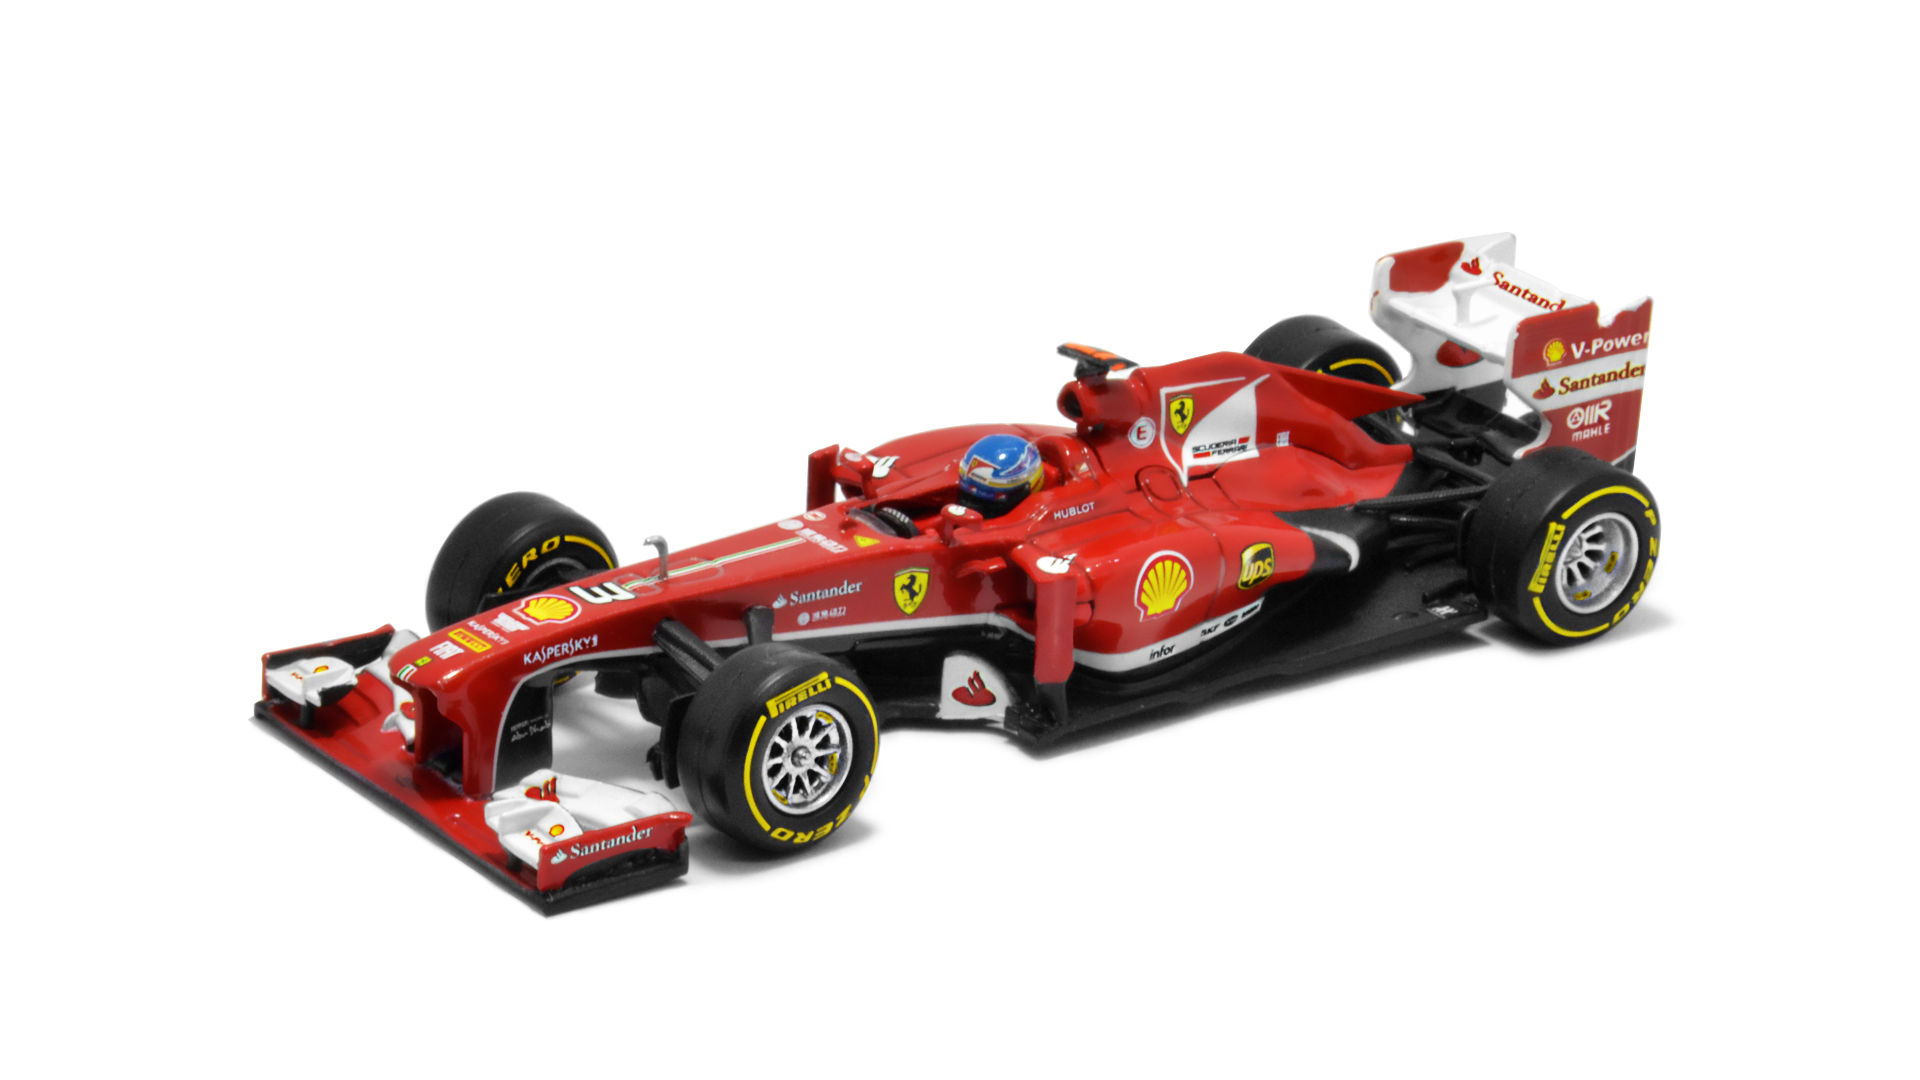 Év: 2013<br />Modell: F138<br />Gyártó: Hot Wheels<br />Pilóta: Fernando Alonso